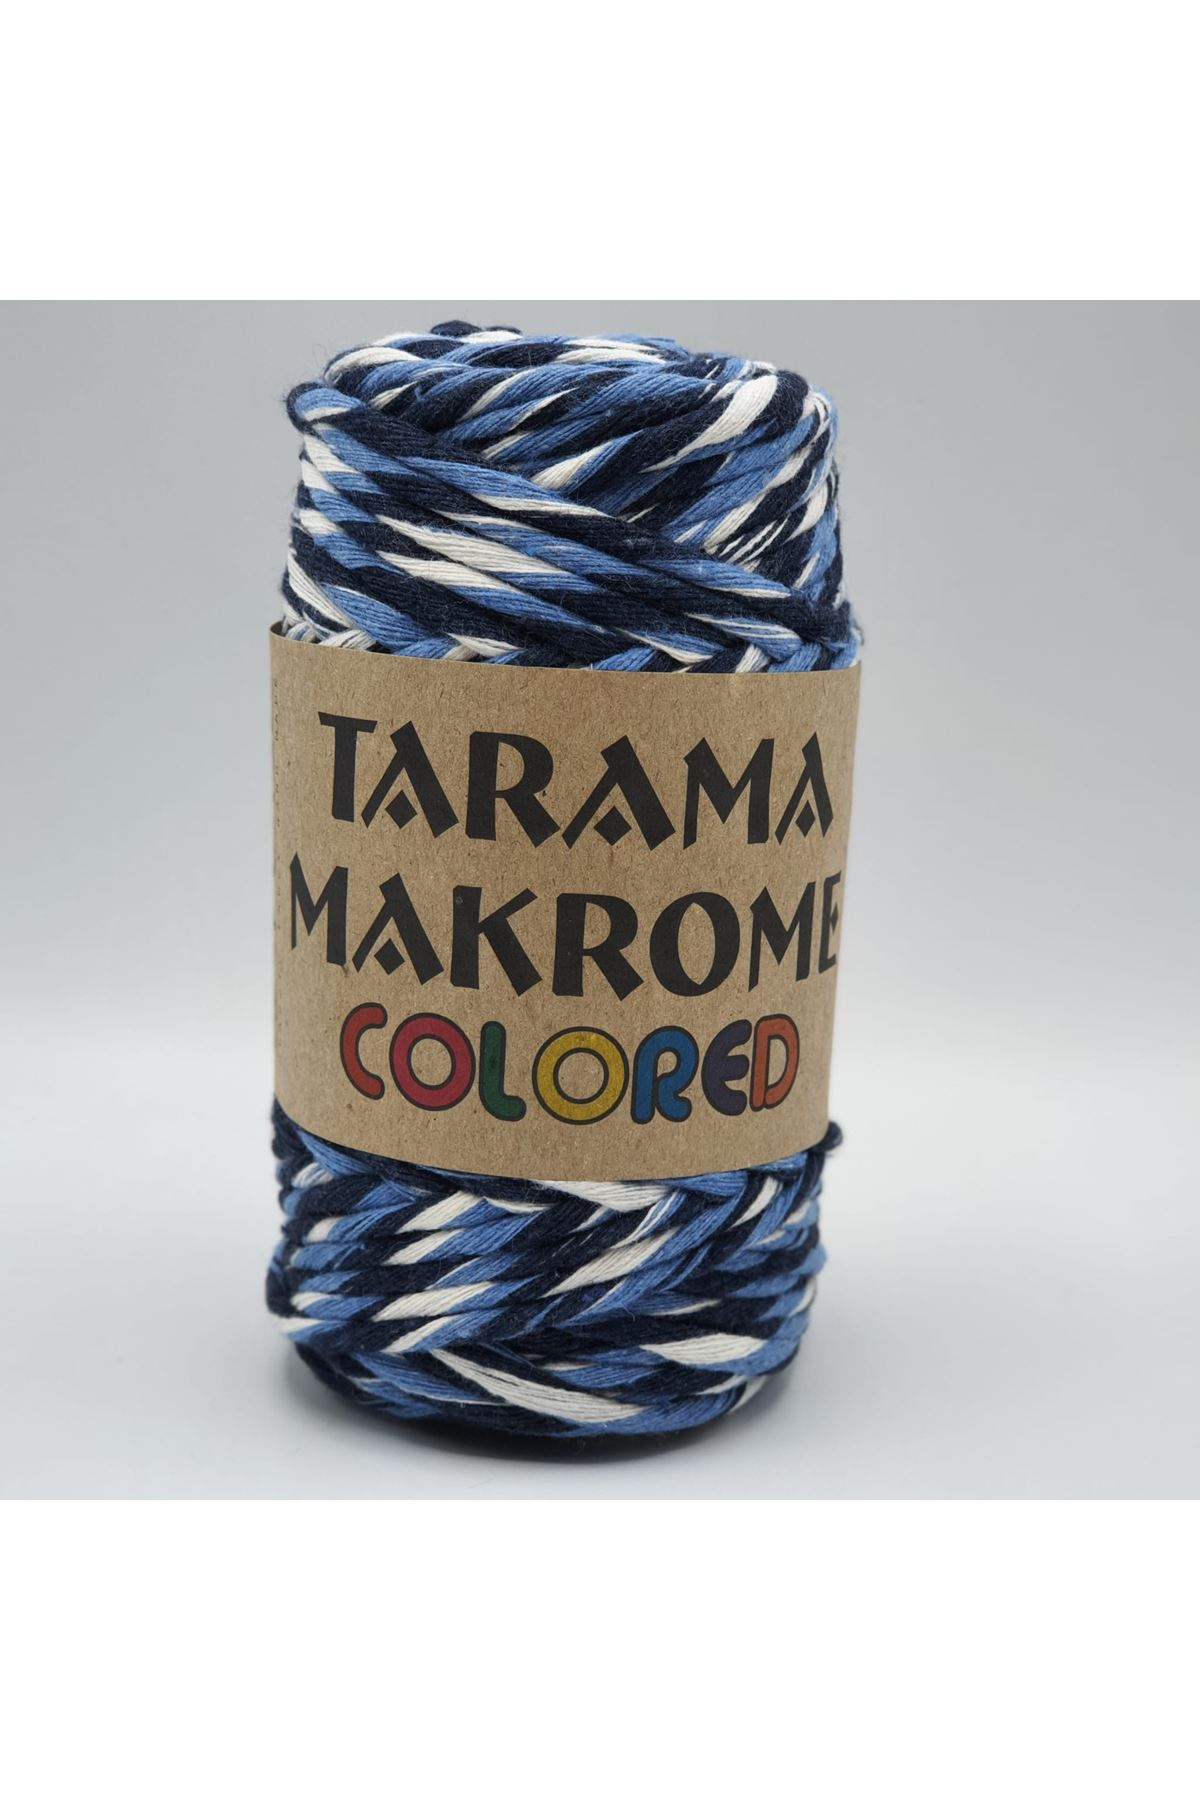 Tarama Makrome Colored 5 mm - 09